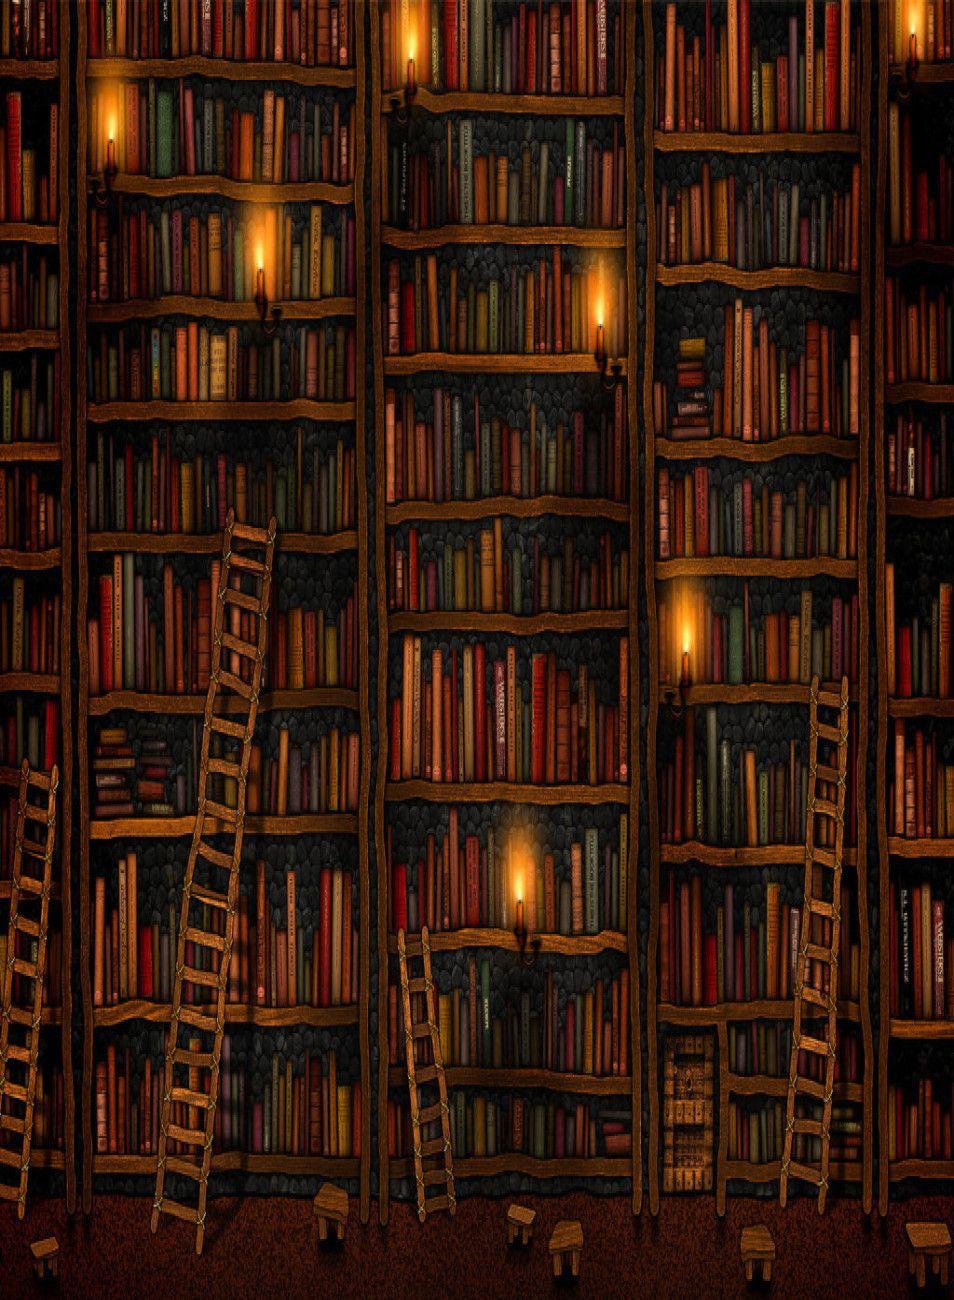 February 2016 – Allis Adventures in Libraryland